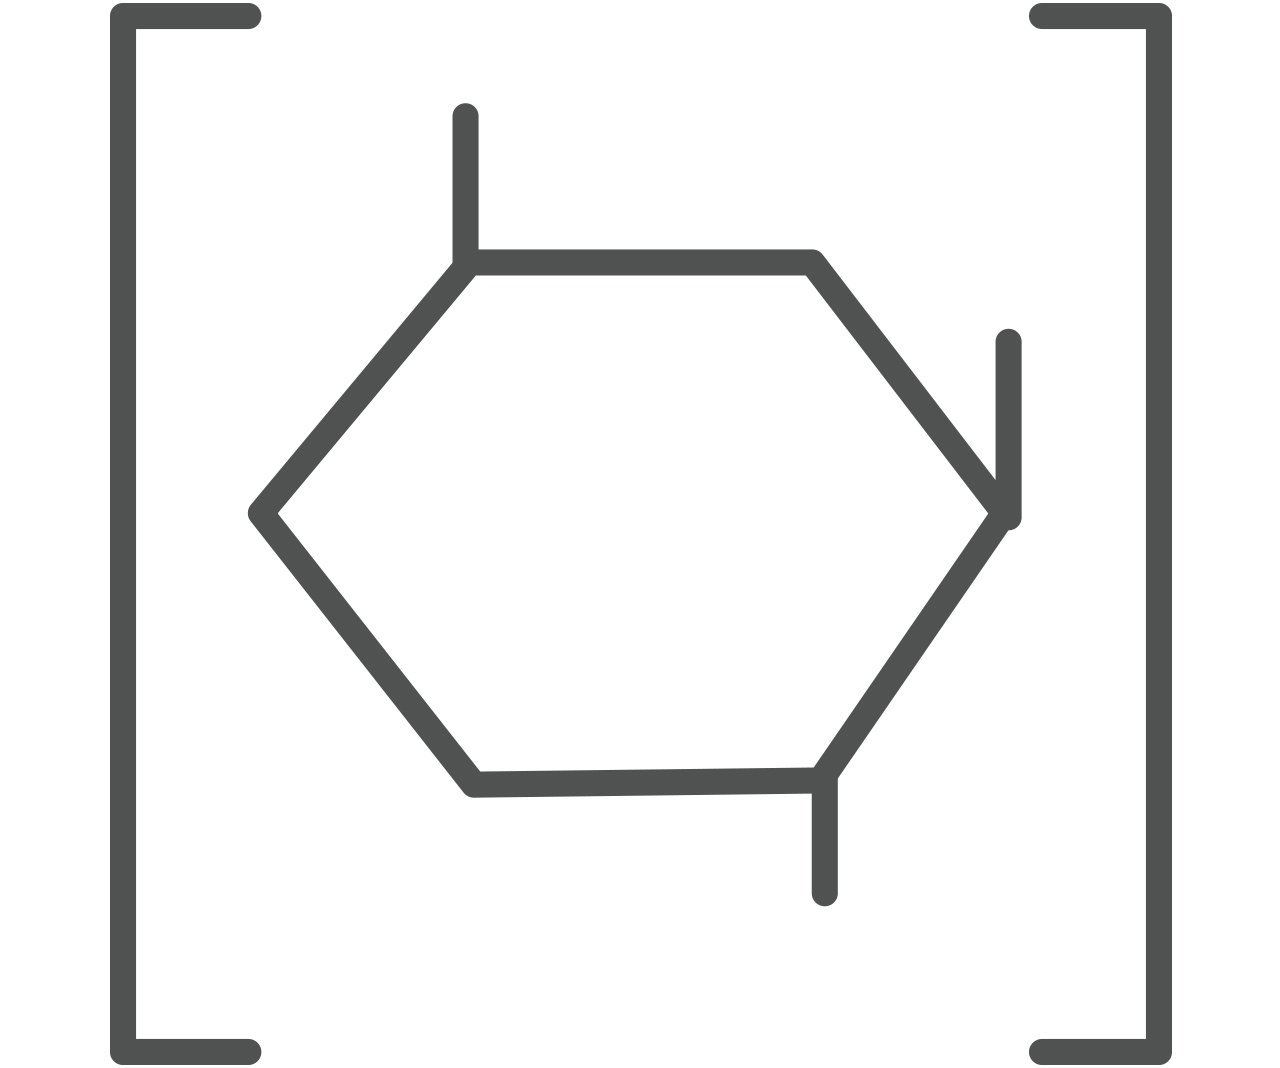 Ingredient for Sodium Borohydride